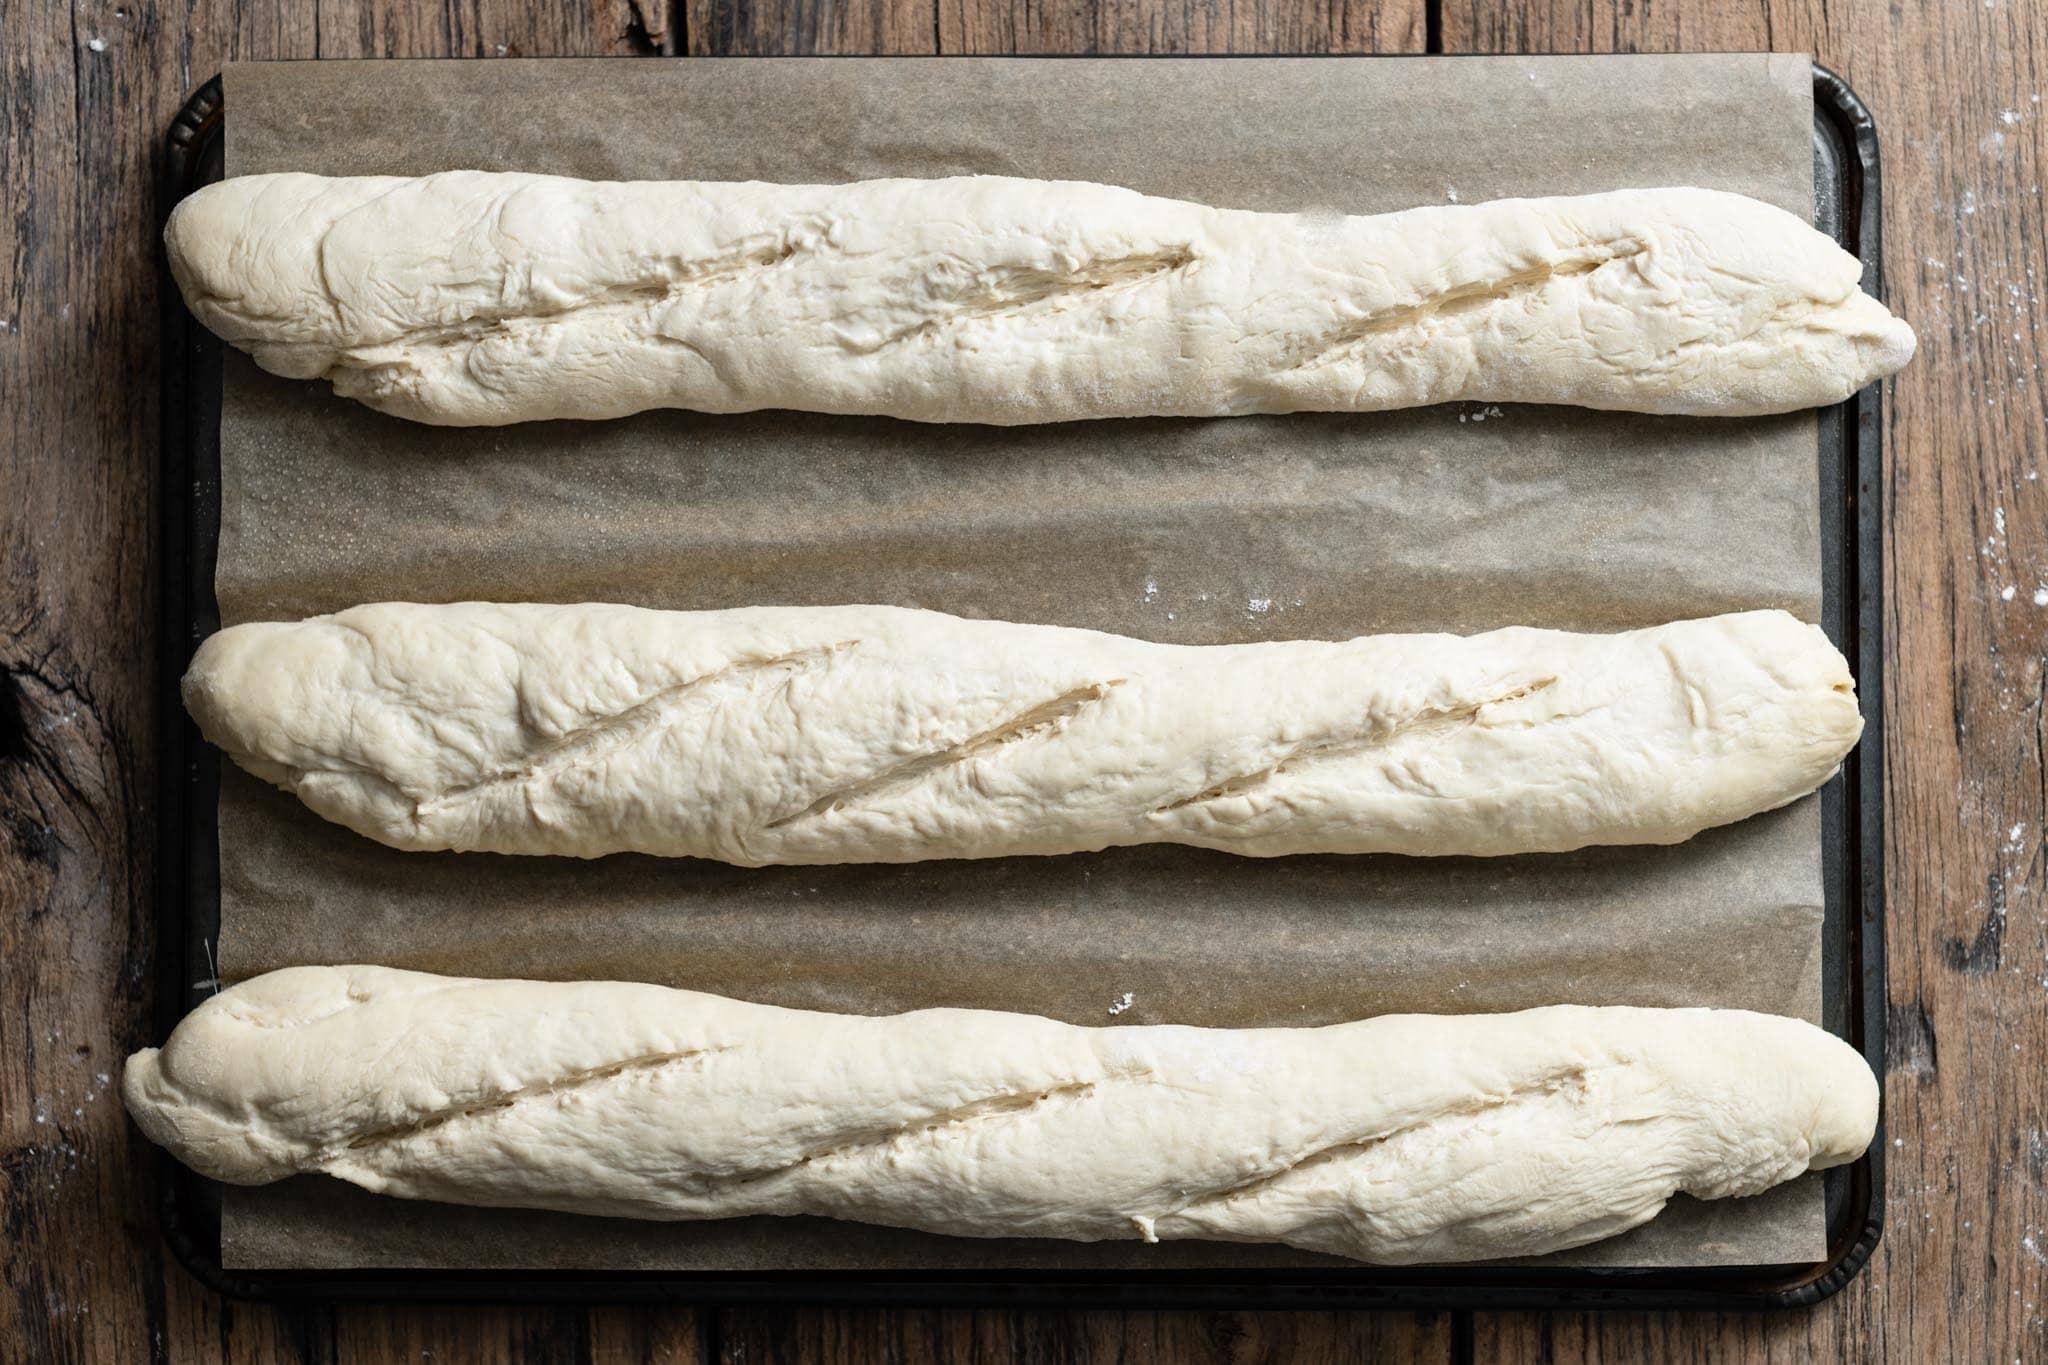 French Baguette dough sliced for baking.